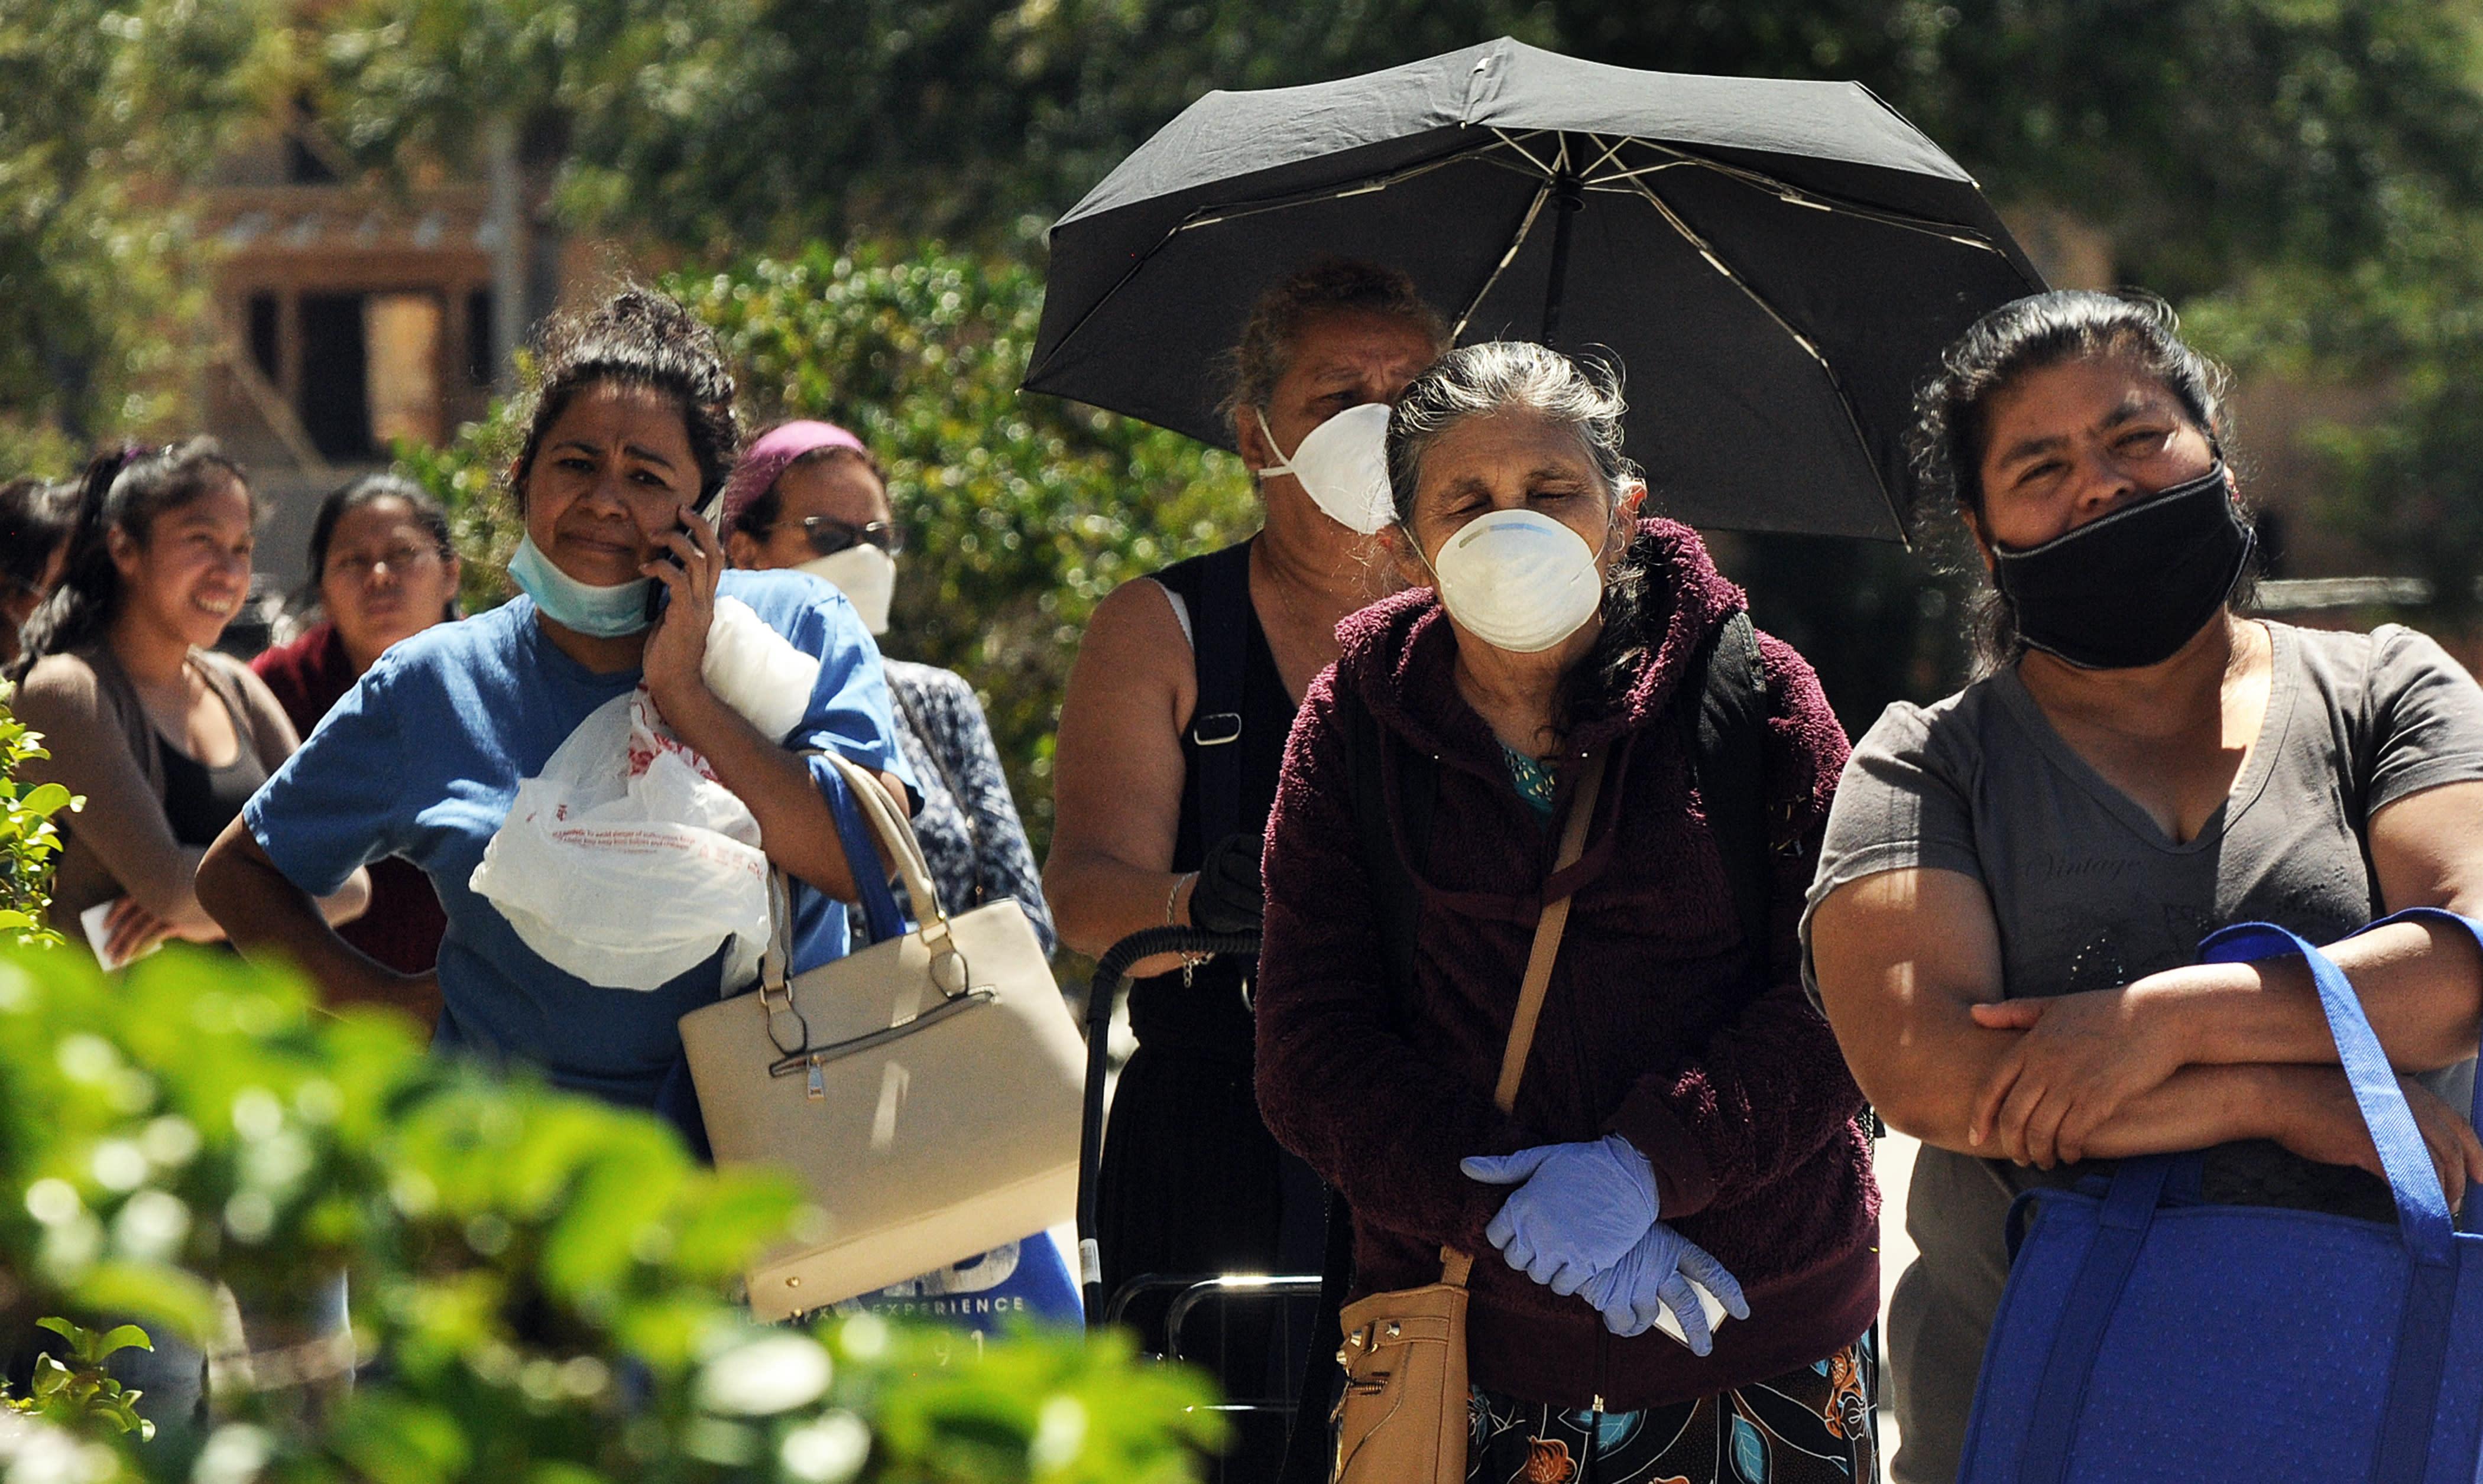 Leaders call on Congress to take action for minorities amid coronavirus